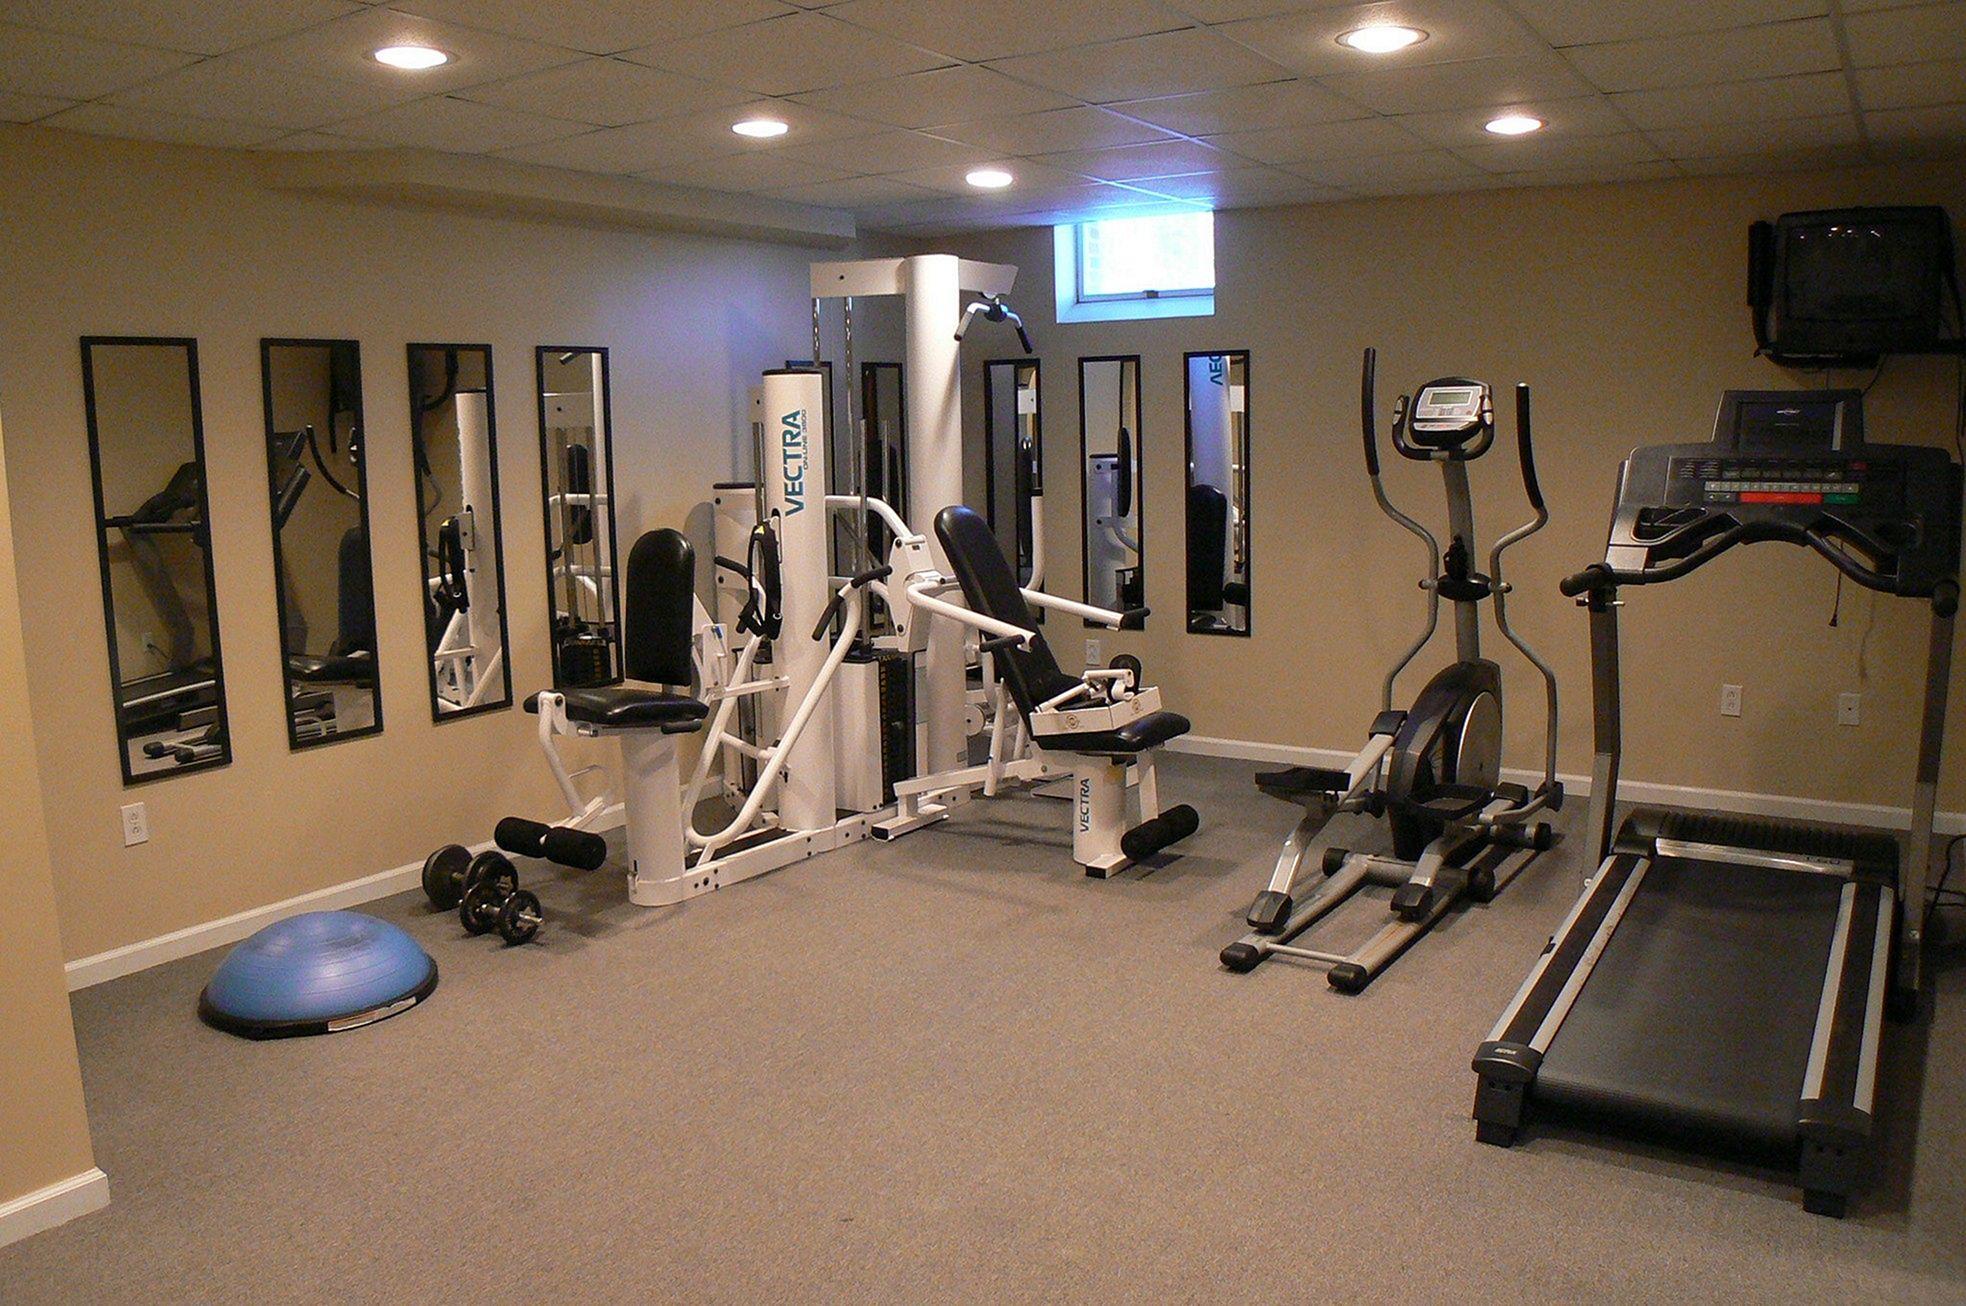 Basement Home Gym Design Idea